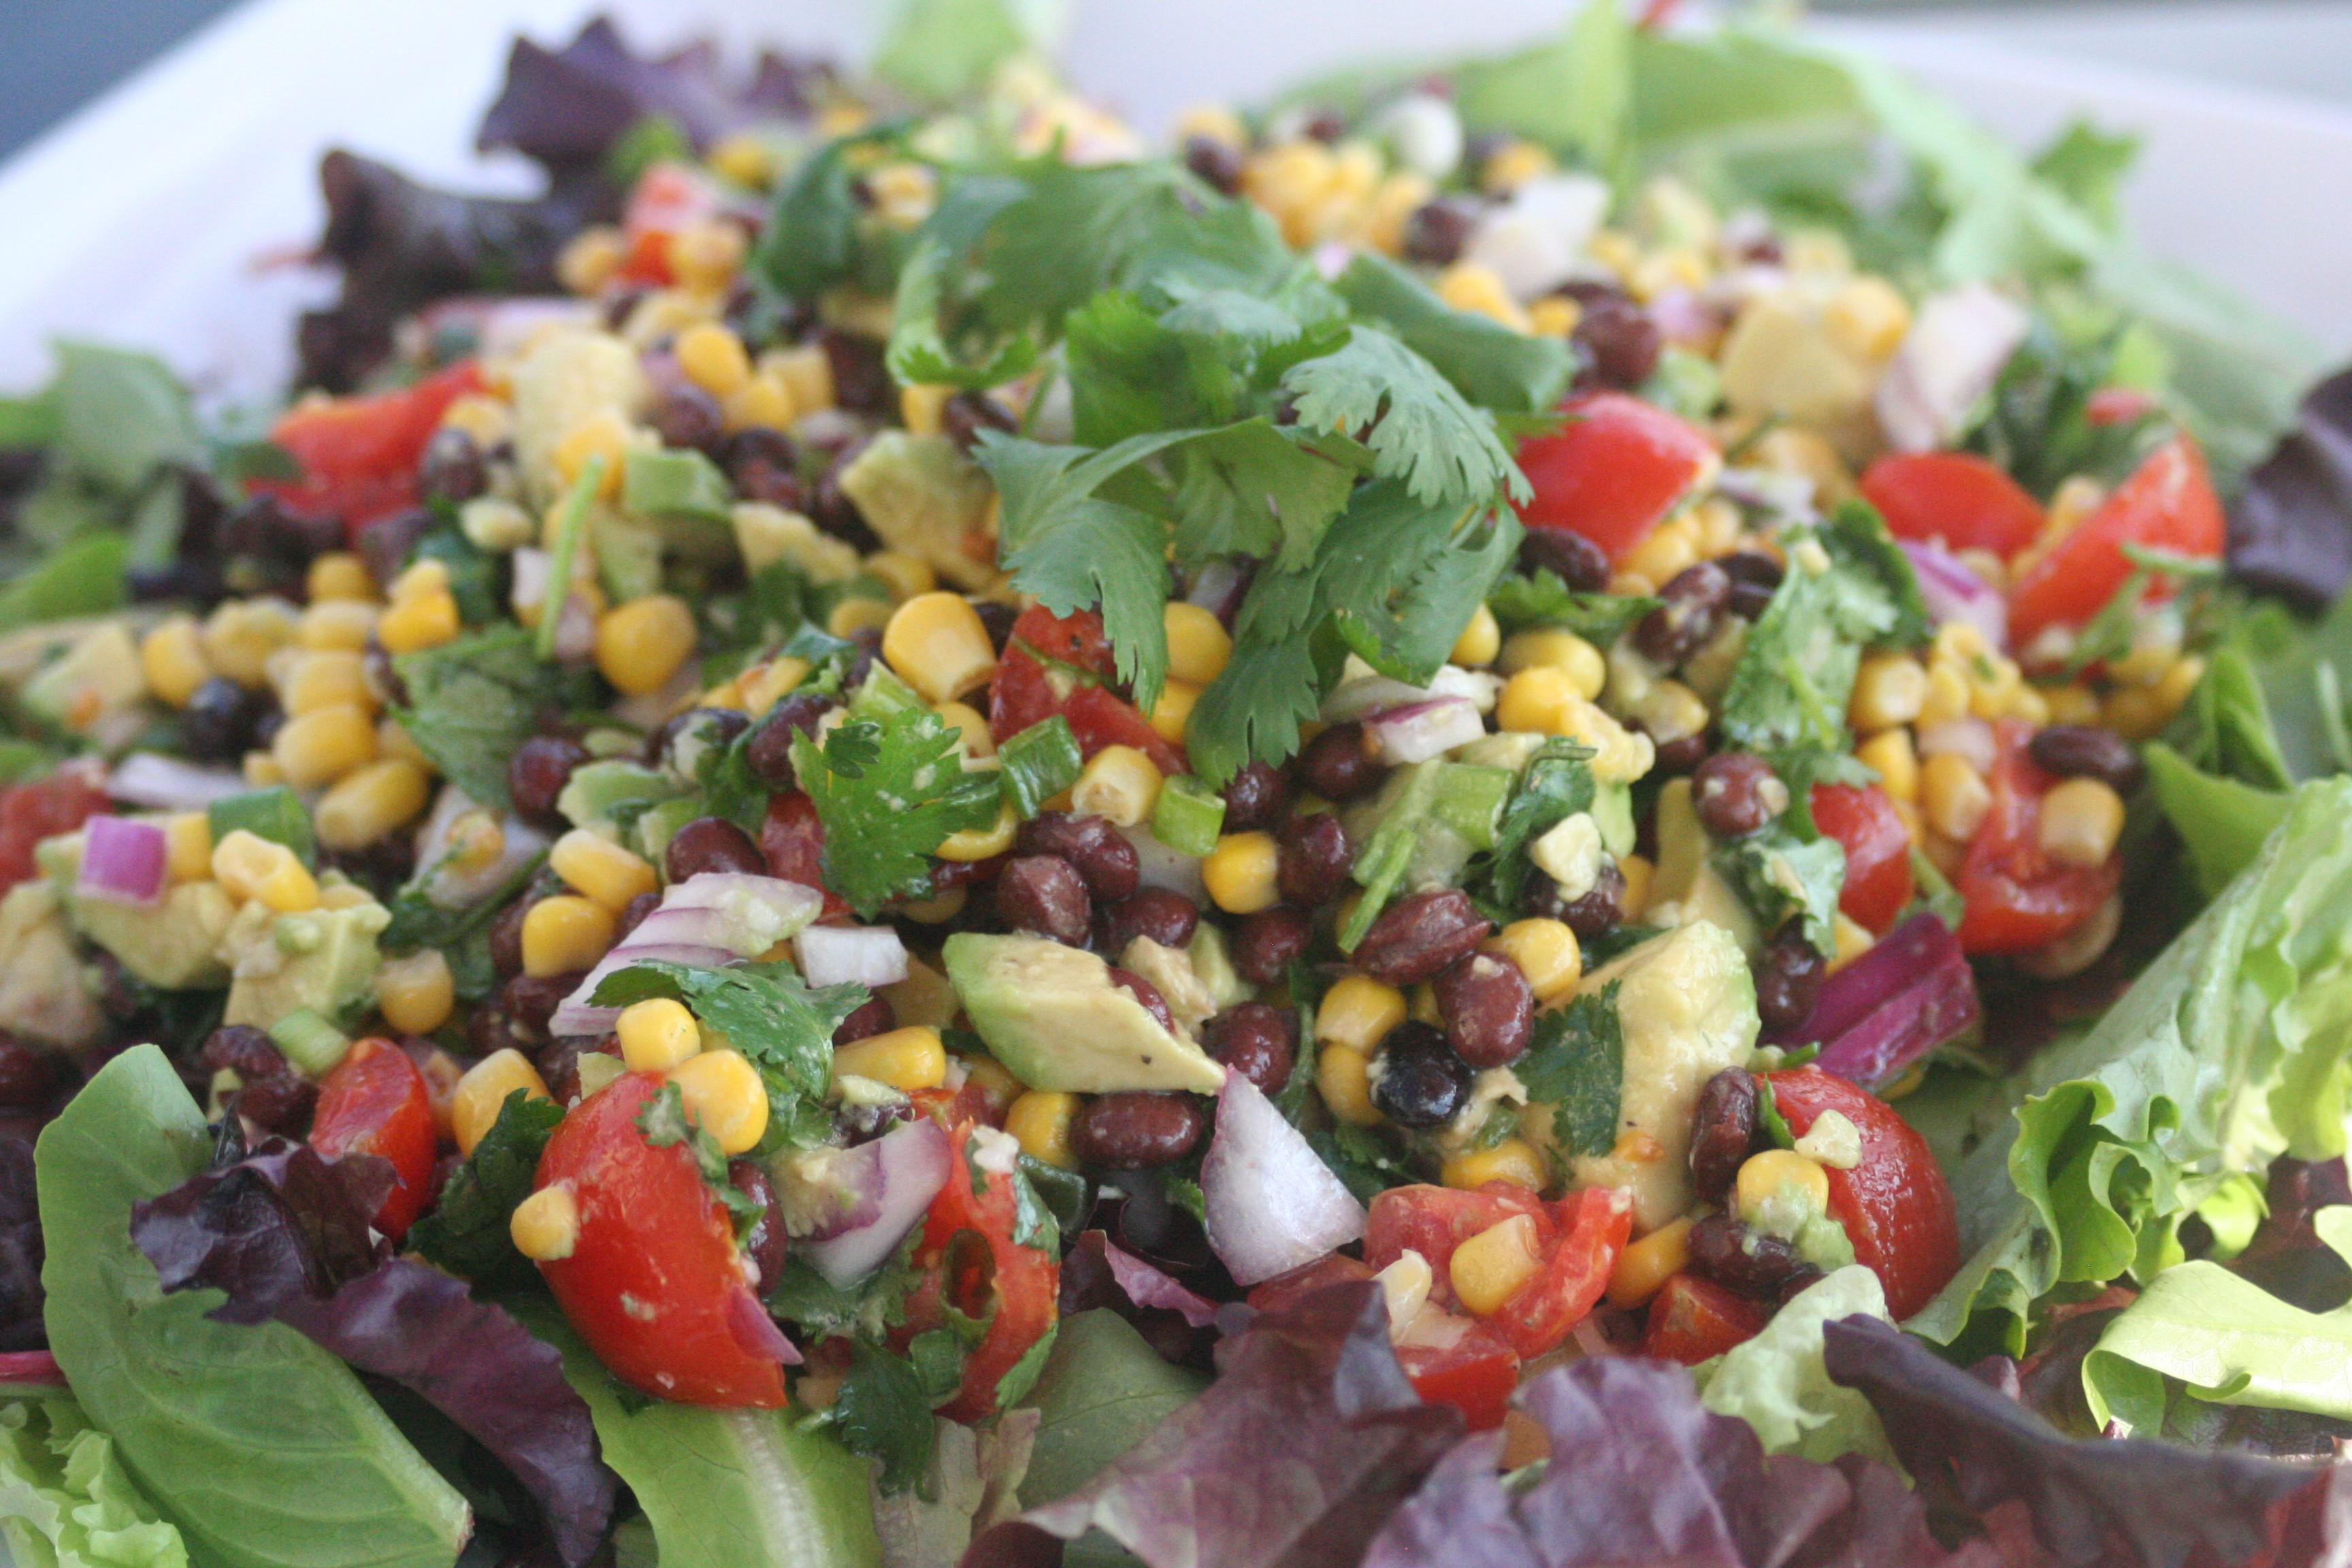 Summer Salad Recipes Vegetarian  The Cooks Next Door Weekend Fare Ve arian Salad